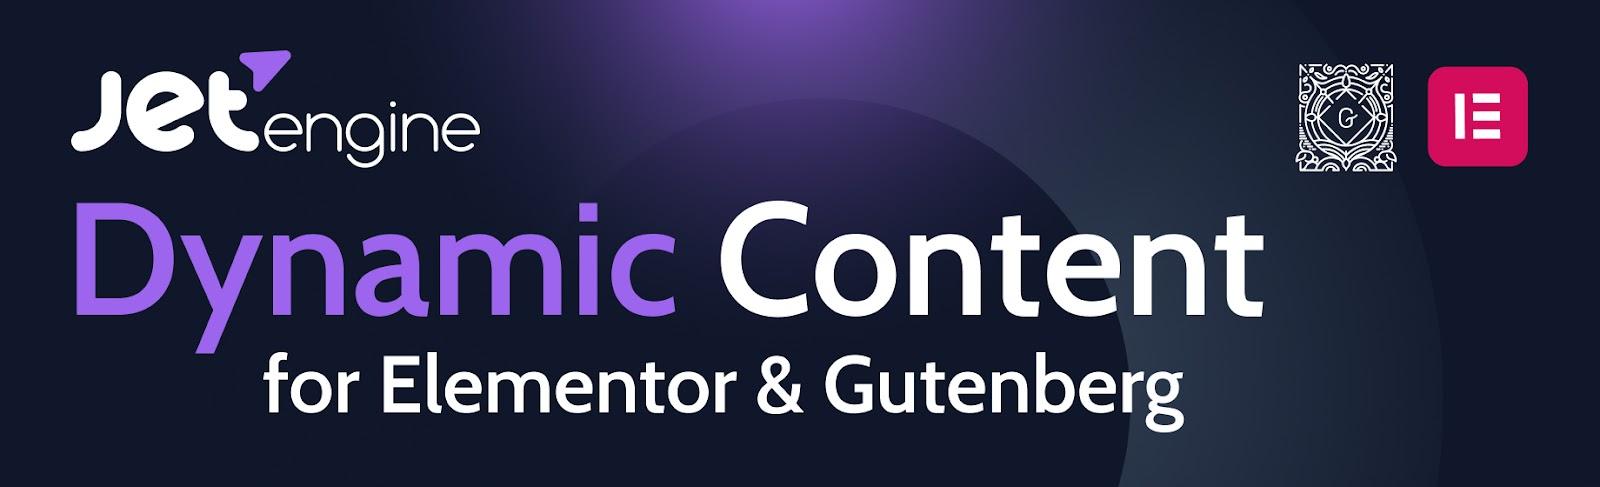 Crocoblock Jet Engine Dyanamic Content ForGutenberg - Gtarafdar